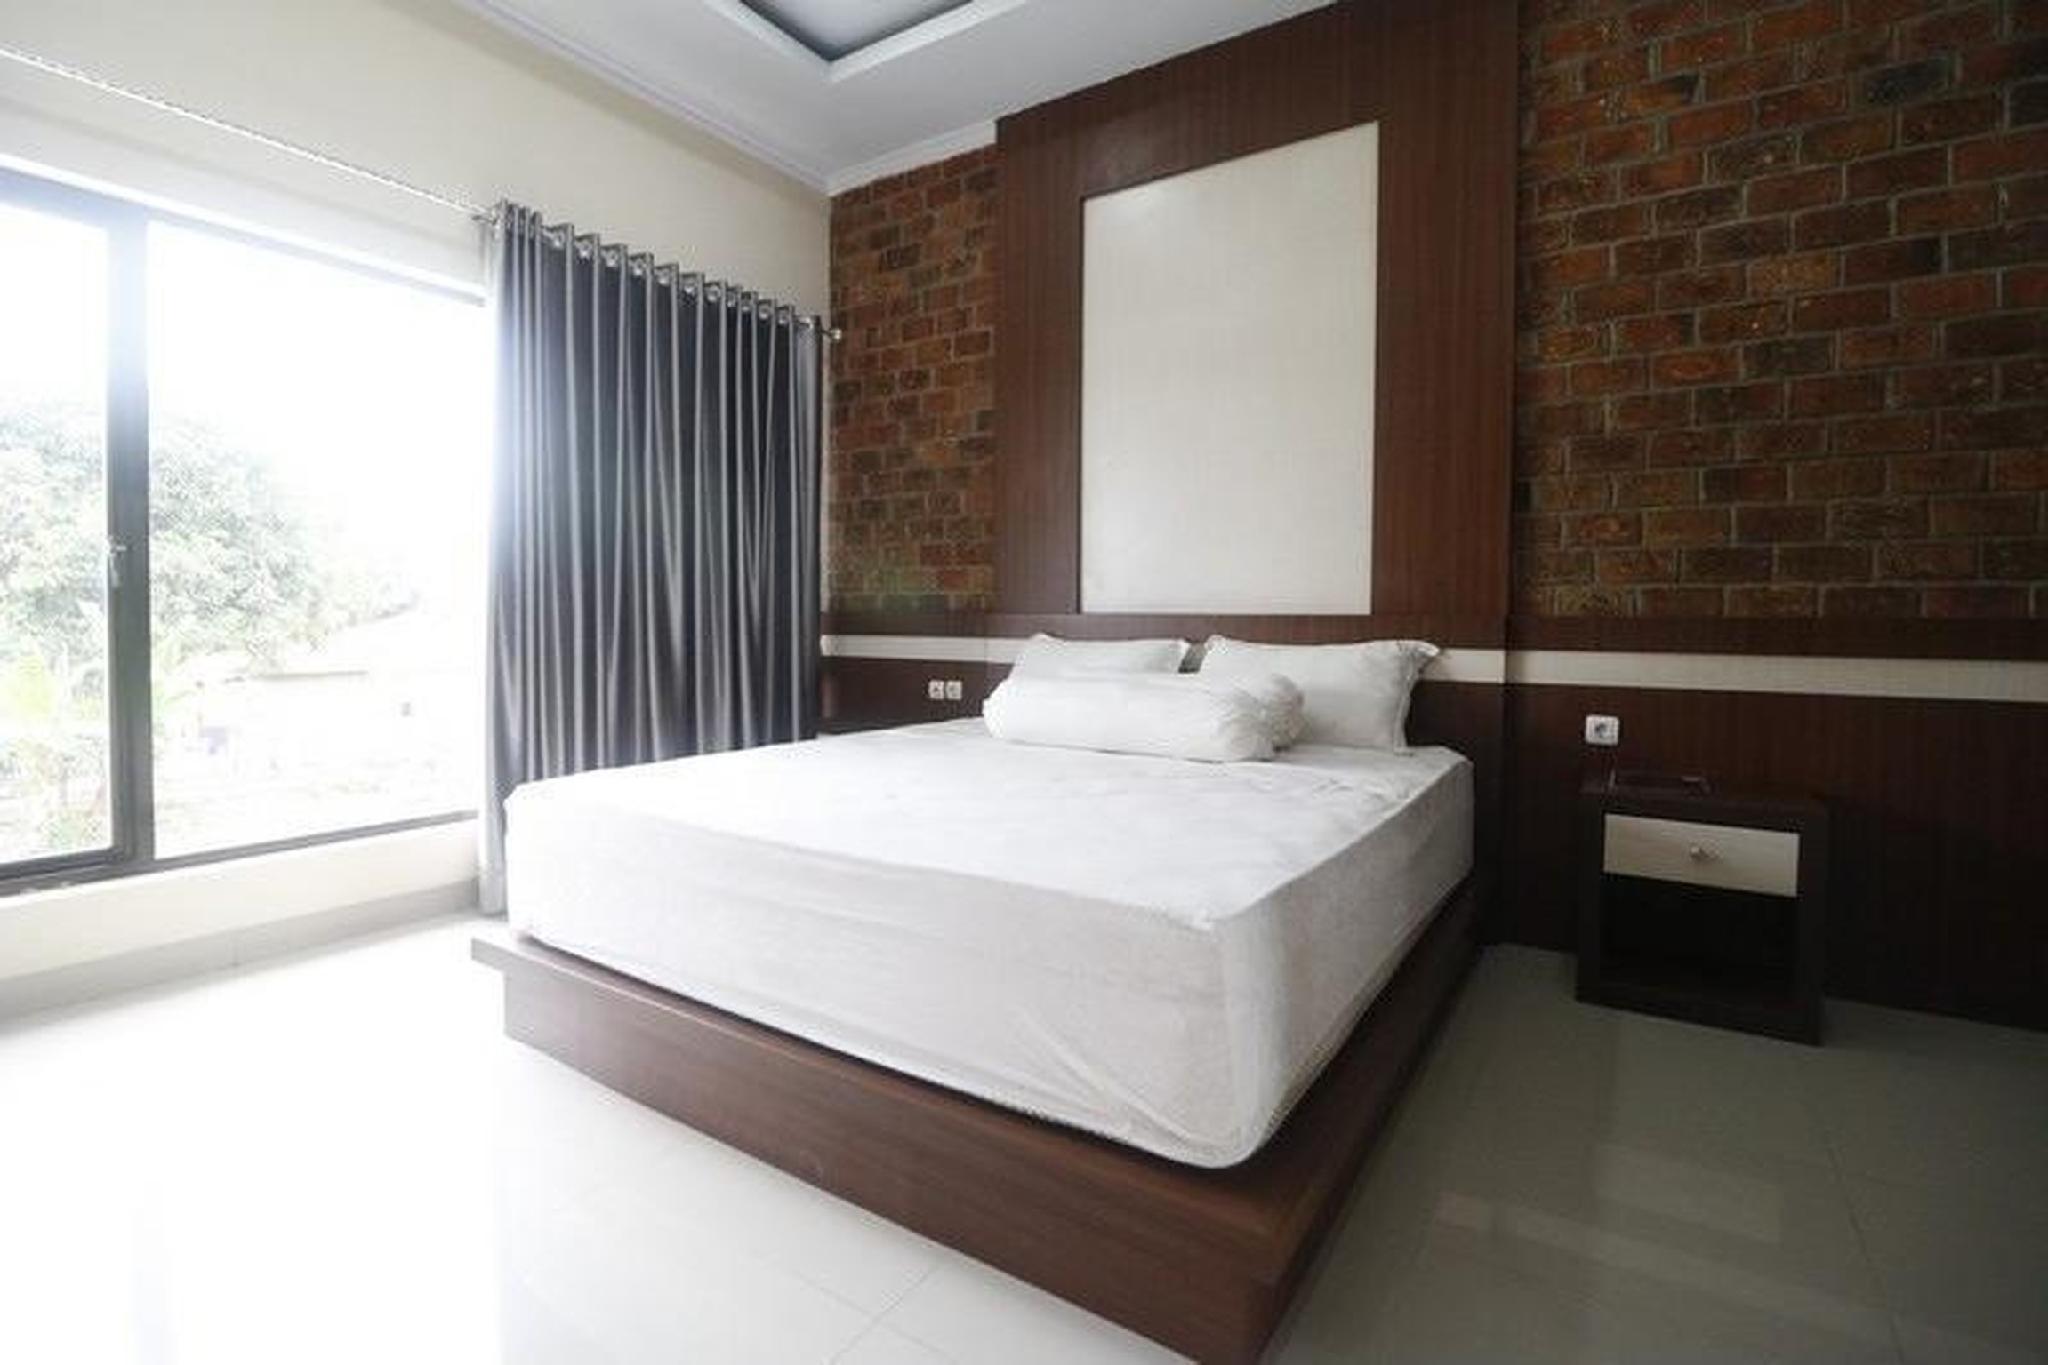 Studio Rumah Kost Kualanamu   Room 7